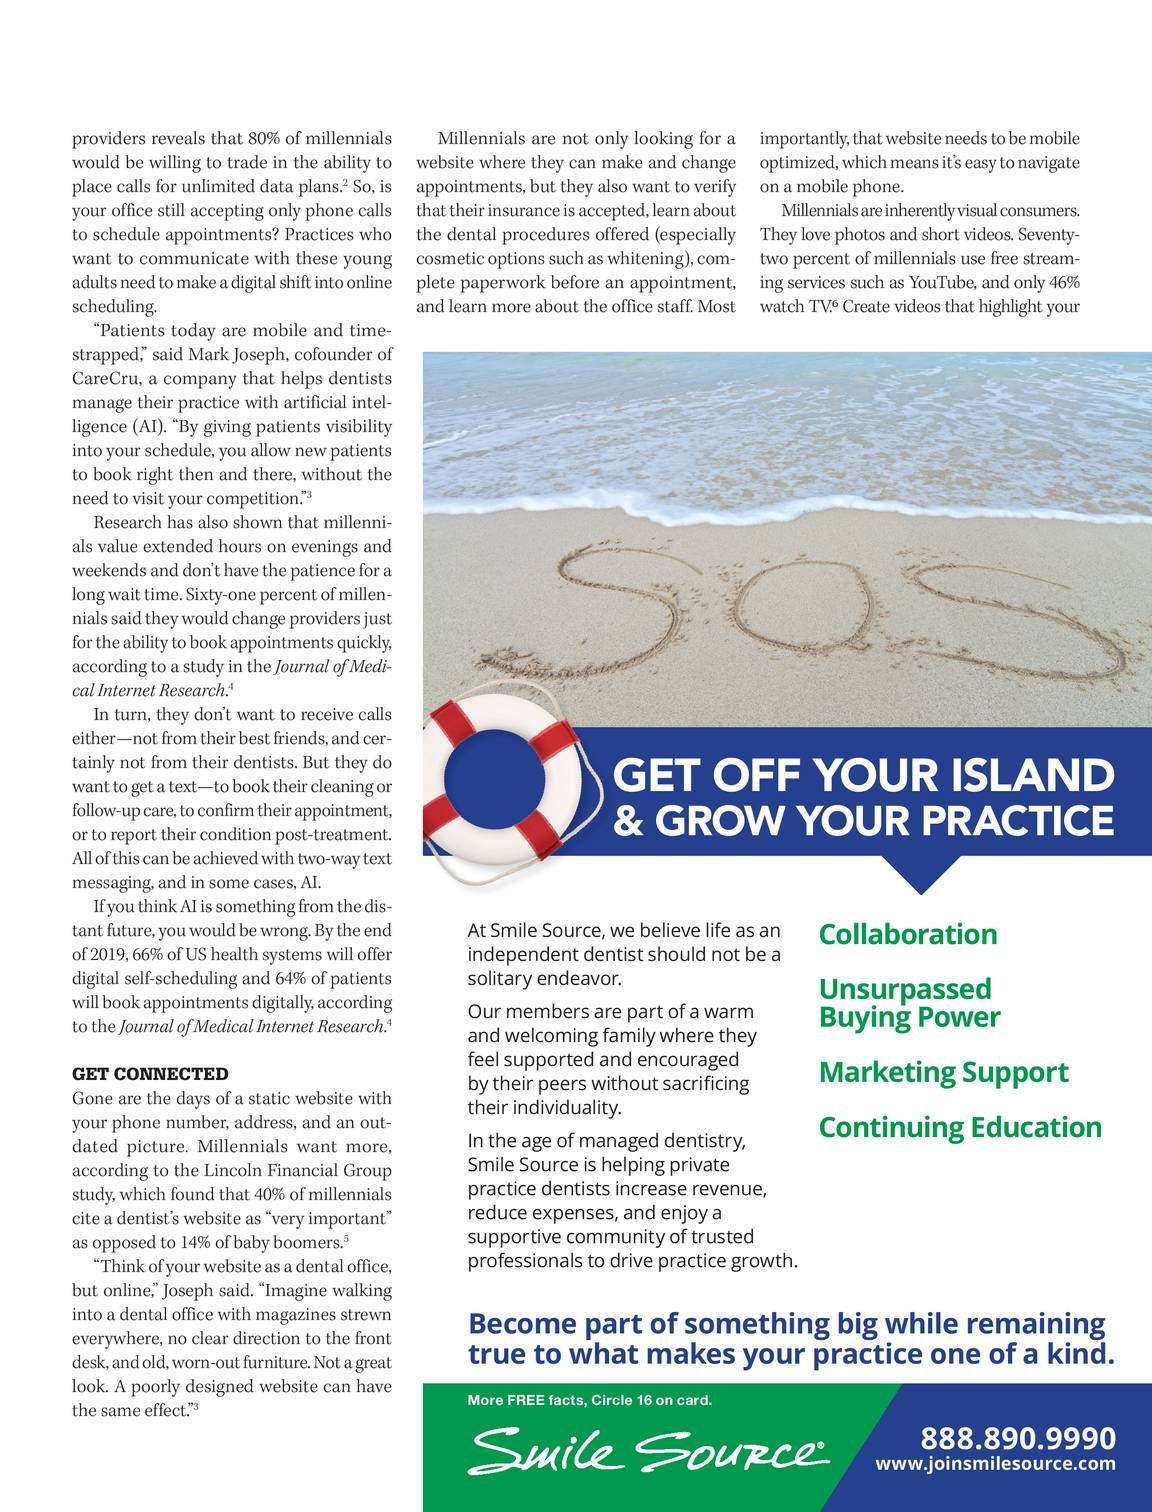 Dental Economics - December 2018 - page 30